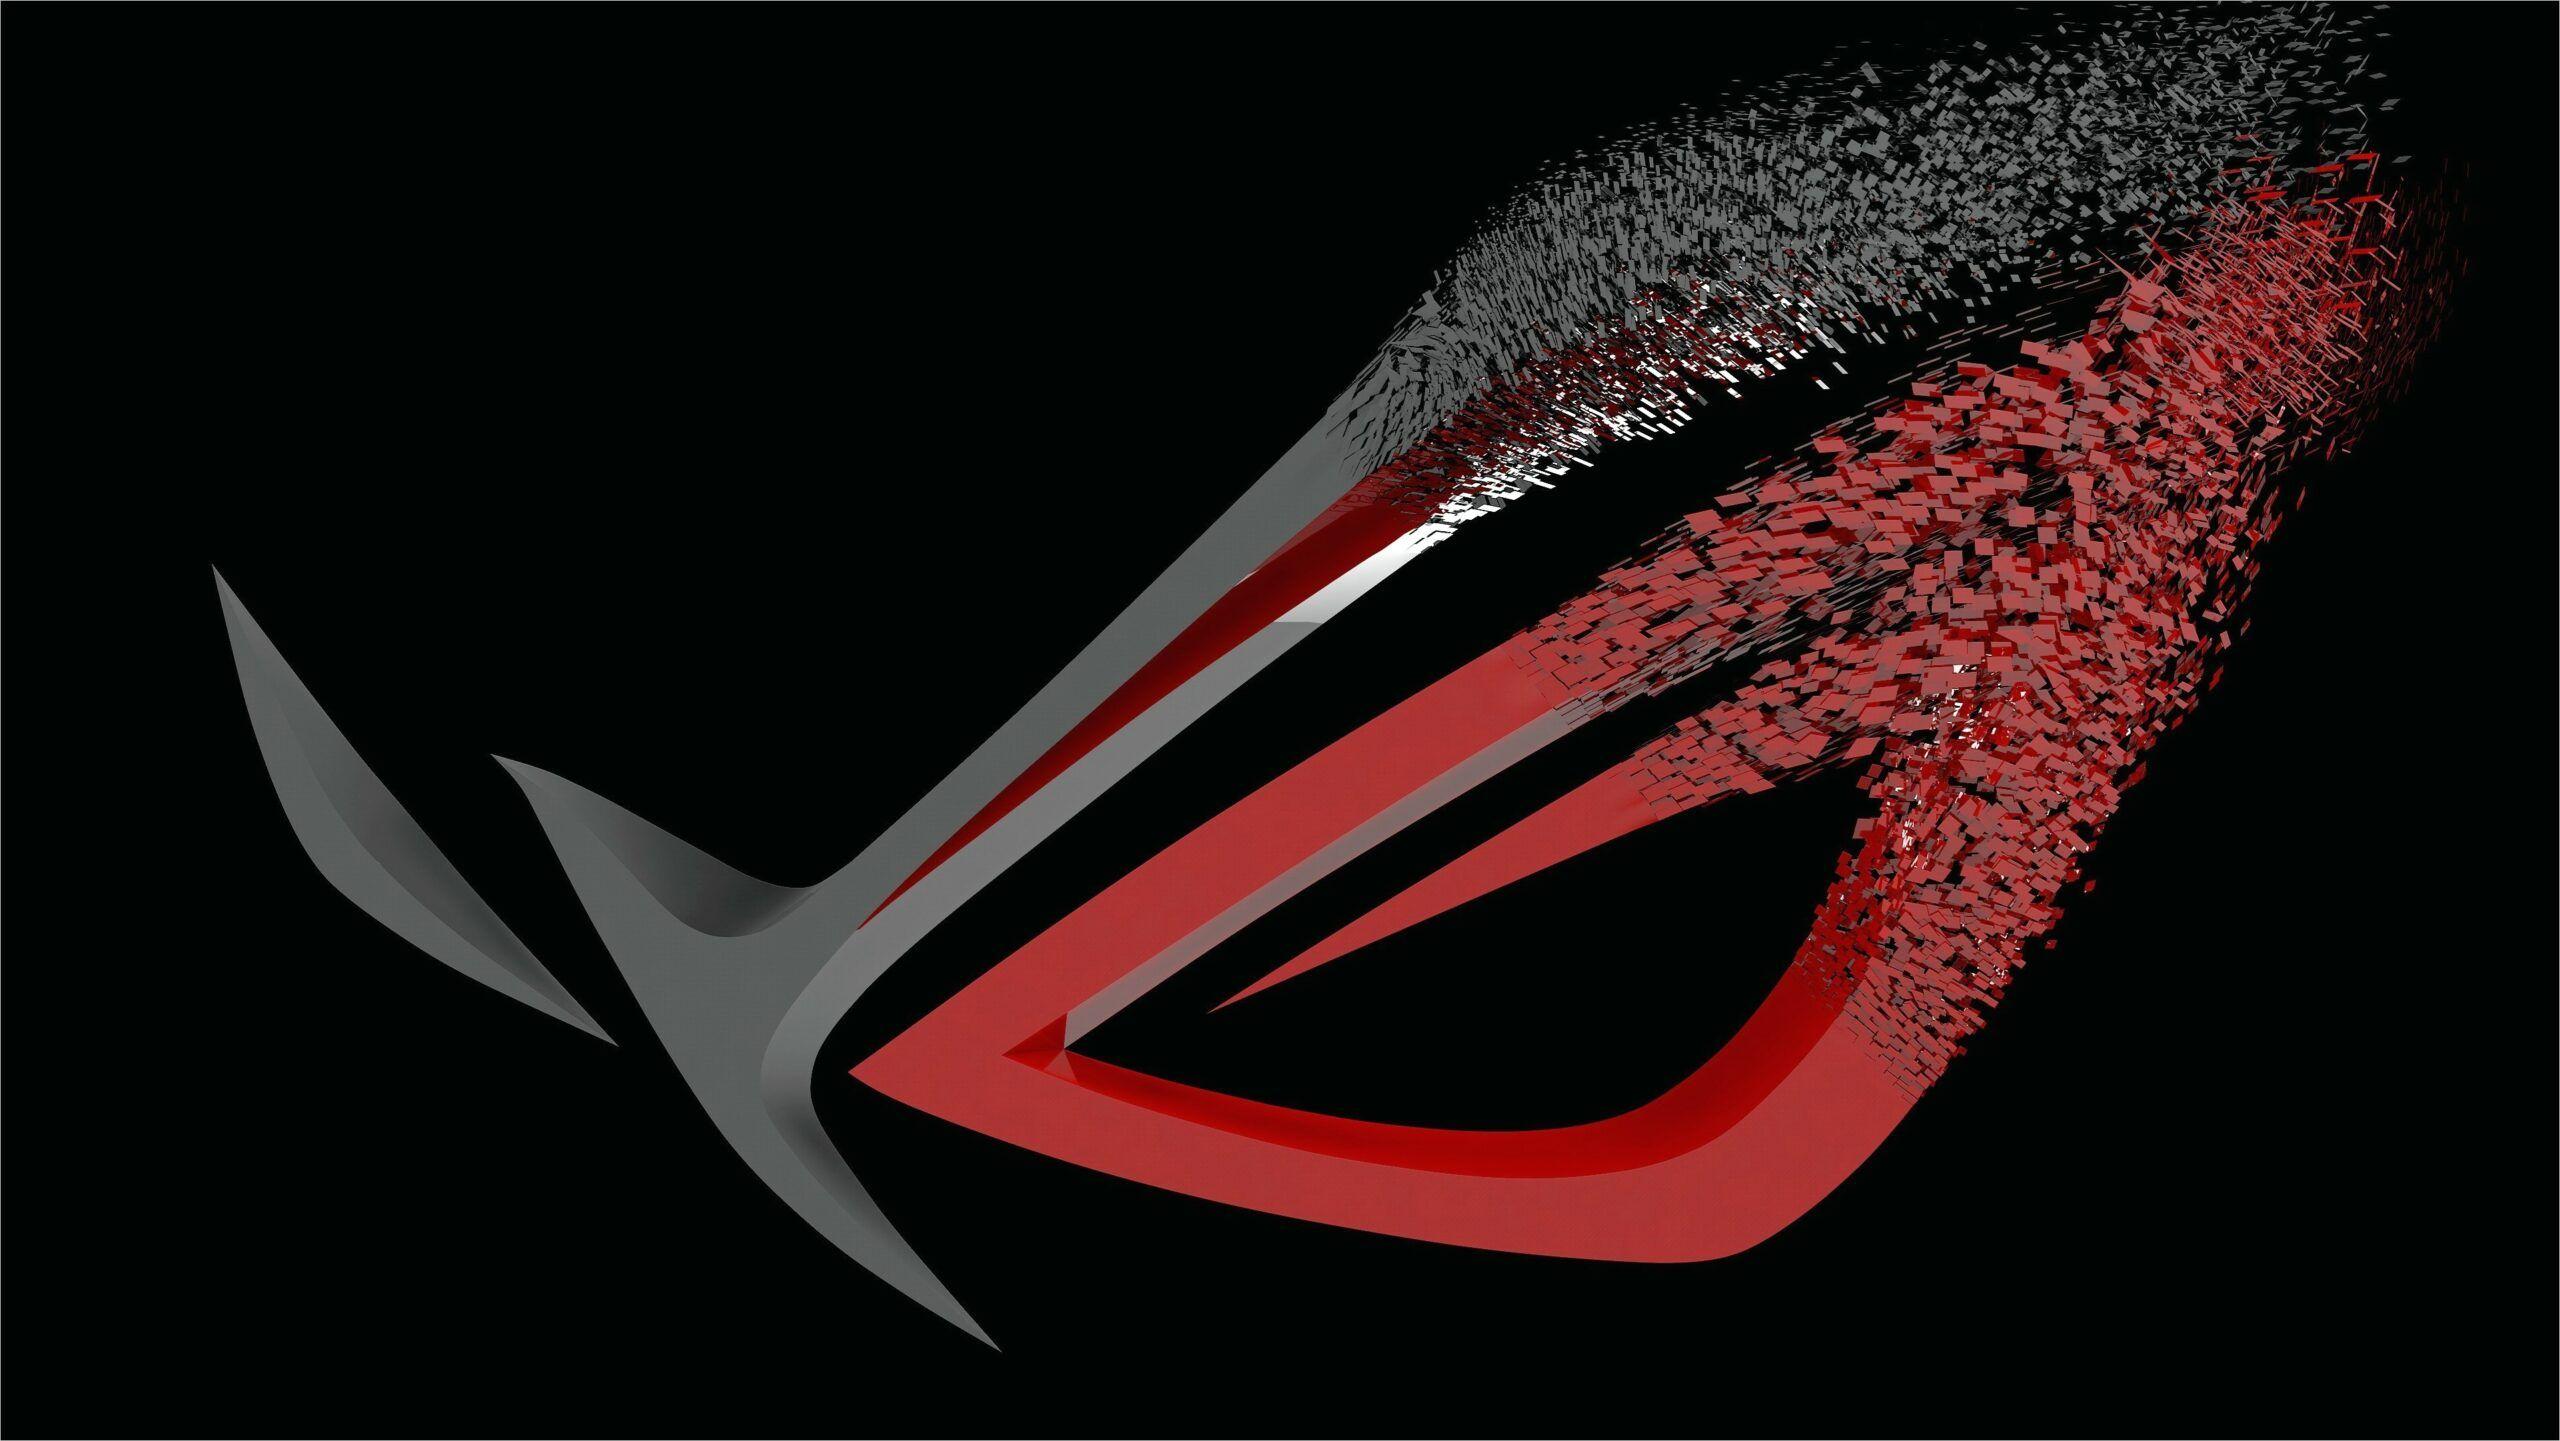 4k Nvidia Wallpaper Red In 2020 4k Desktop Wallpapers Wallpaper Desktop Wallpaper